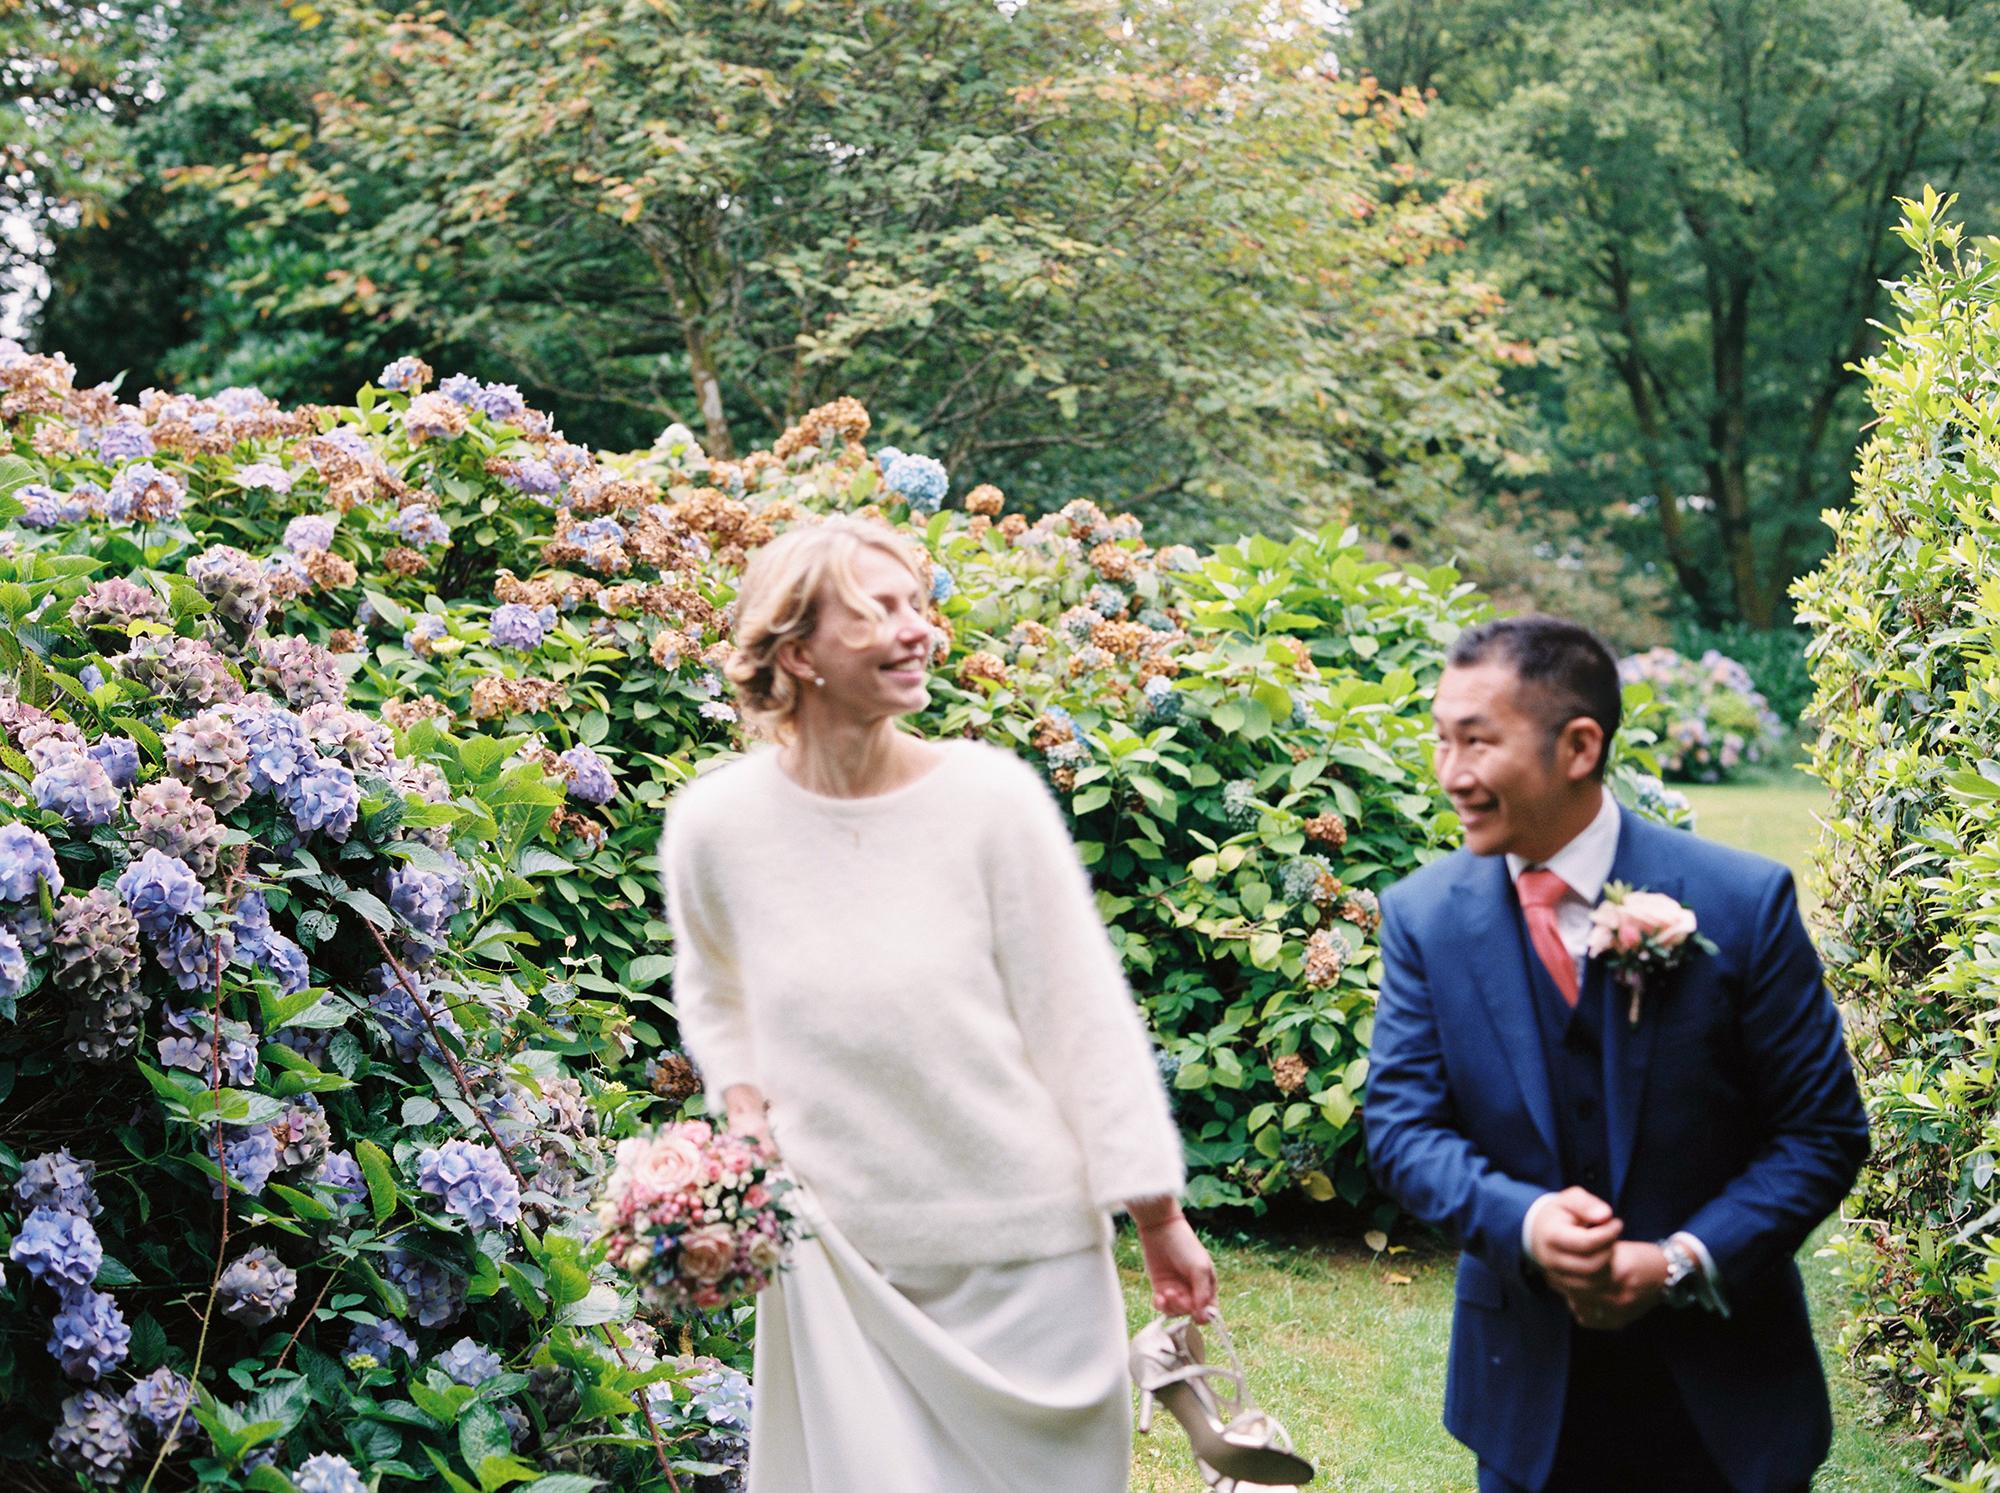 wedding_photographer_cumbria156.jpg